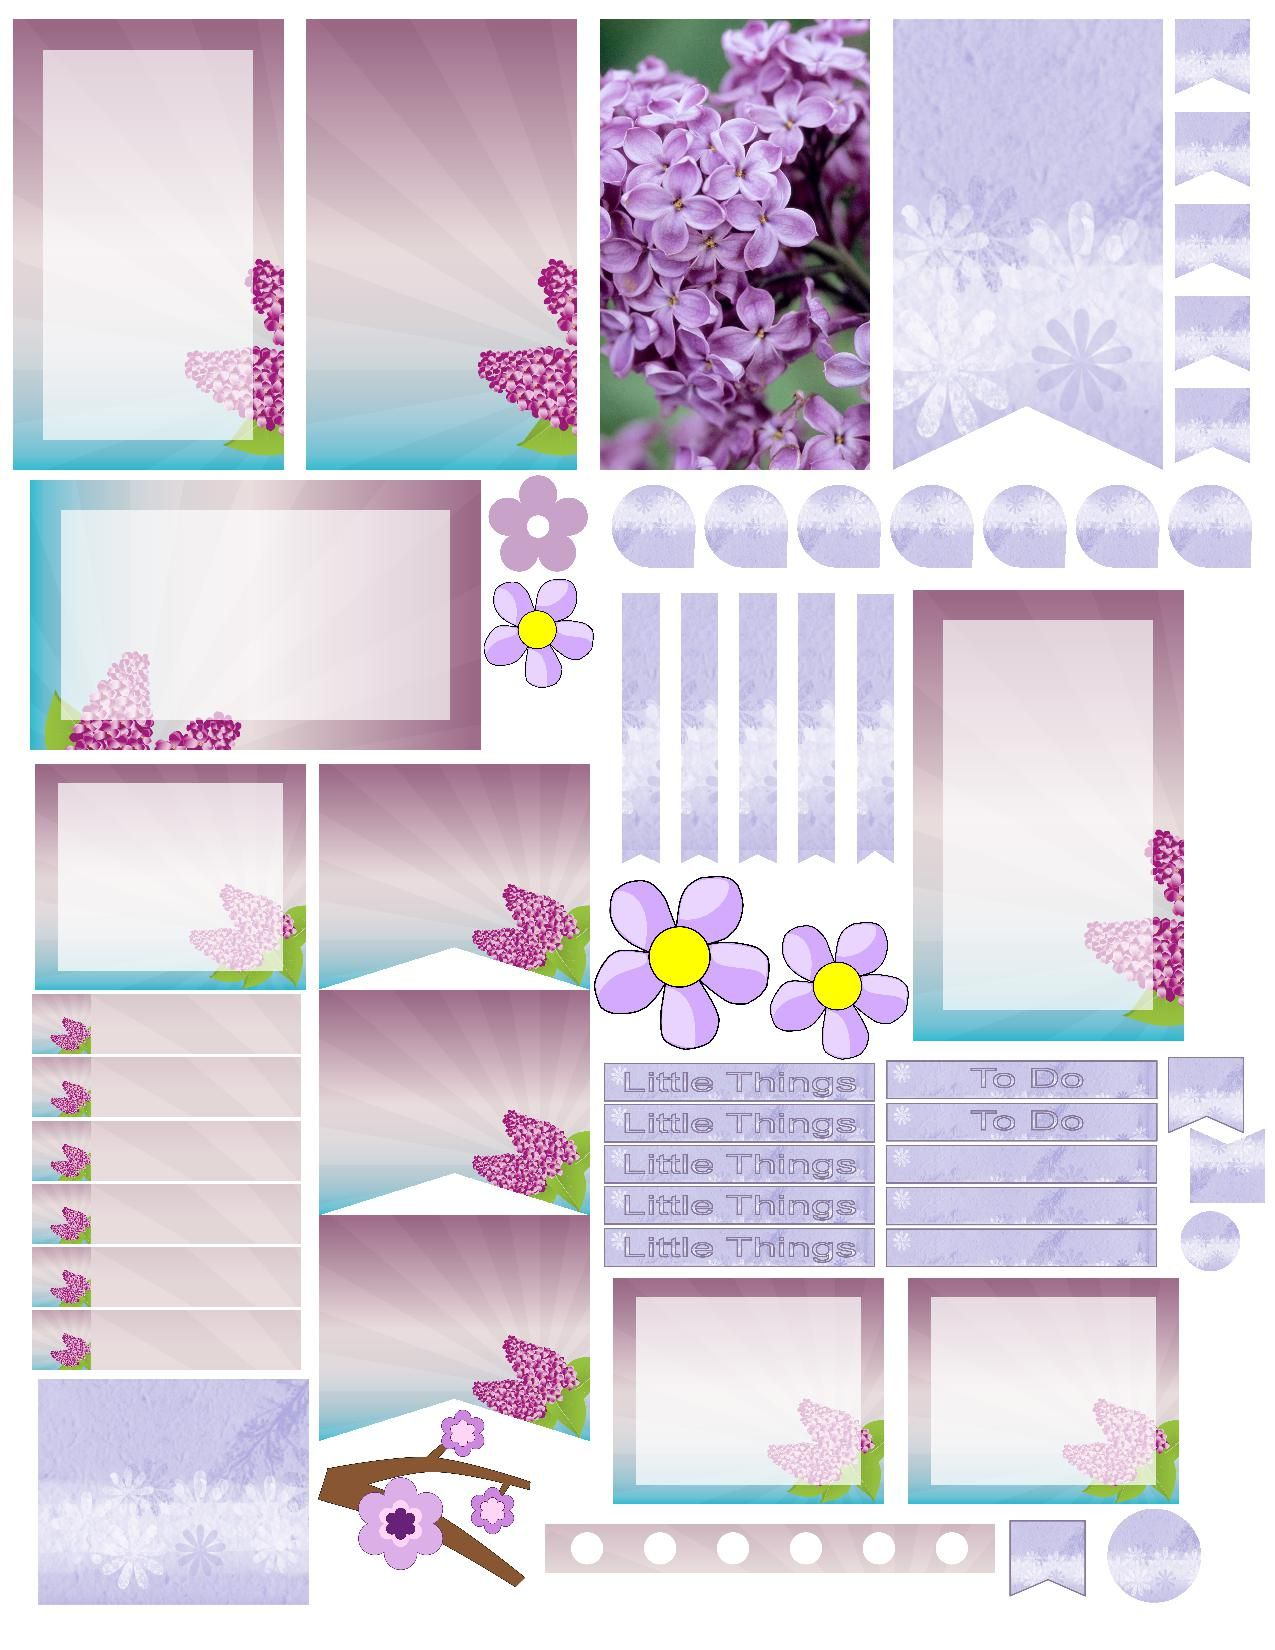 best 25 walk planner ideas on pinterest pax wardrobe planner ikea pax wardrobe and ikea room. Black Bedroom Furniture Sets. Home Design Ideas